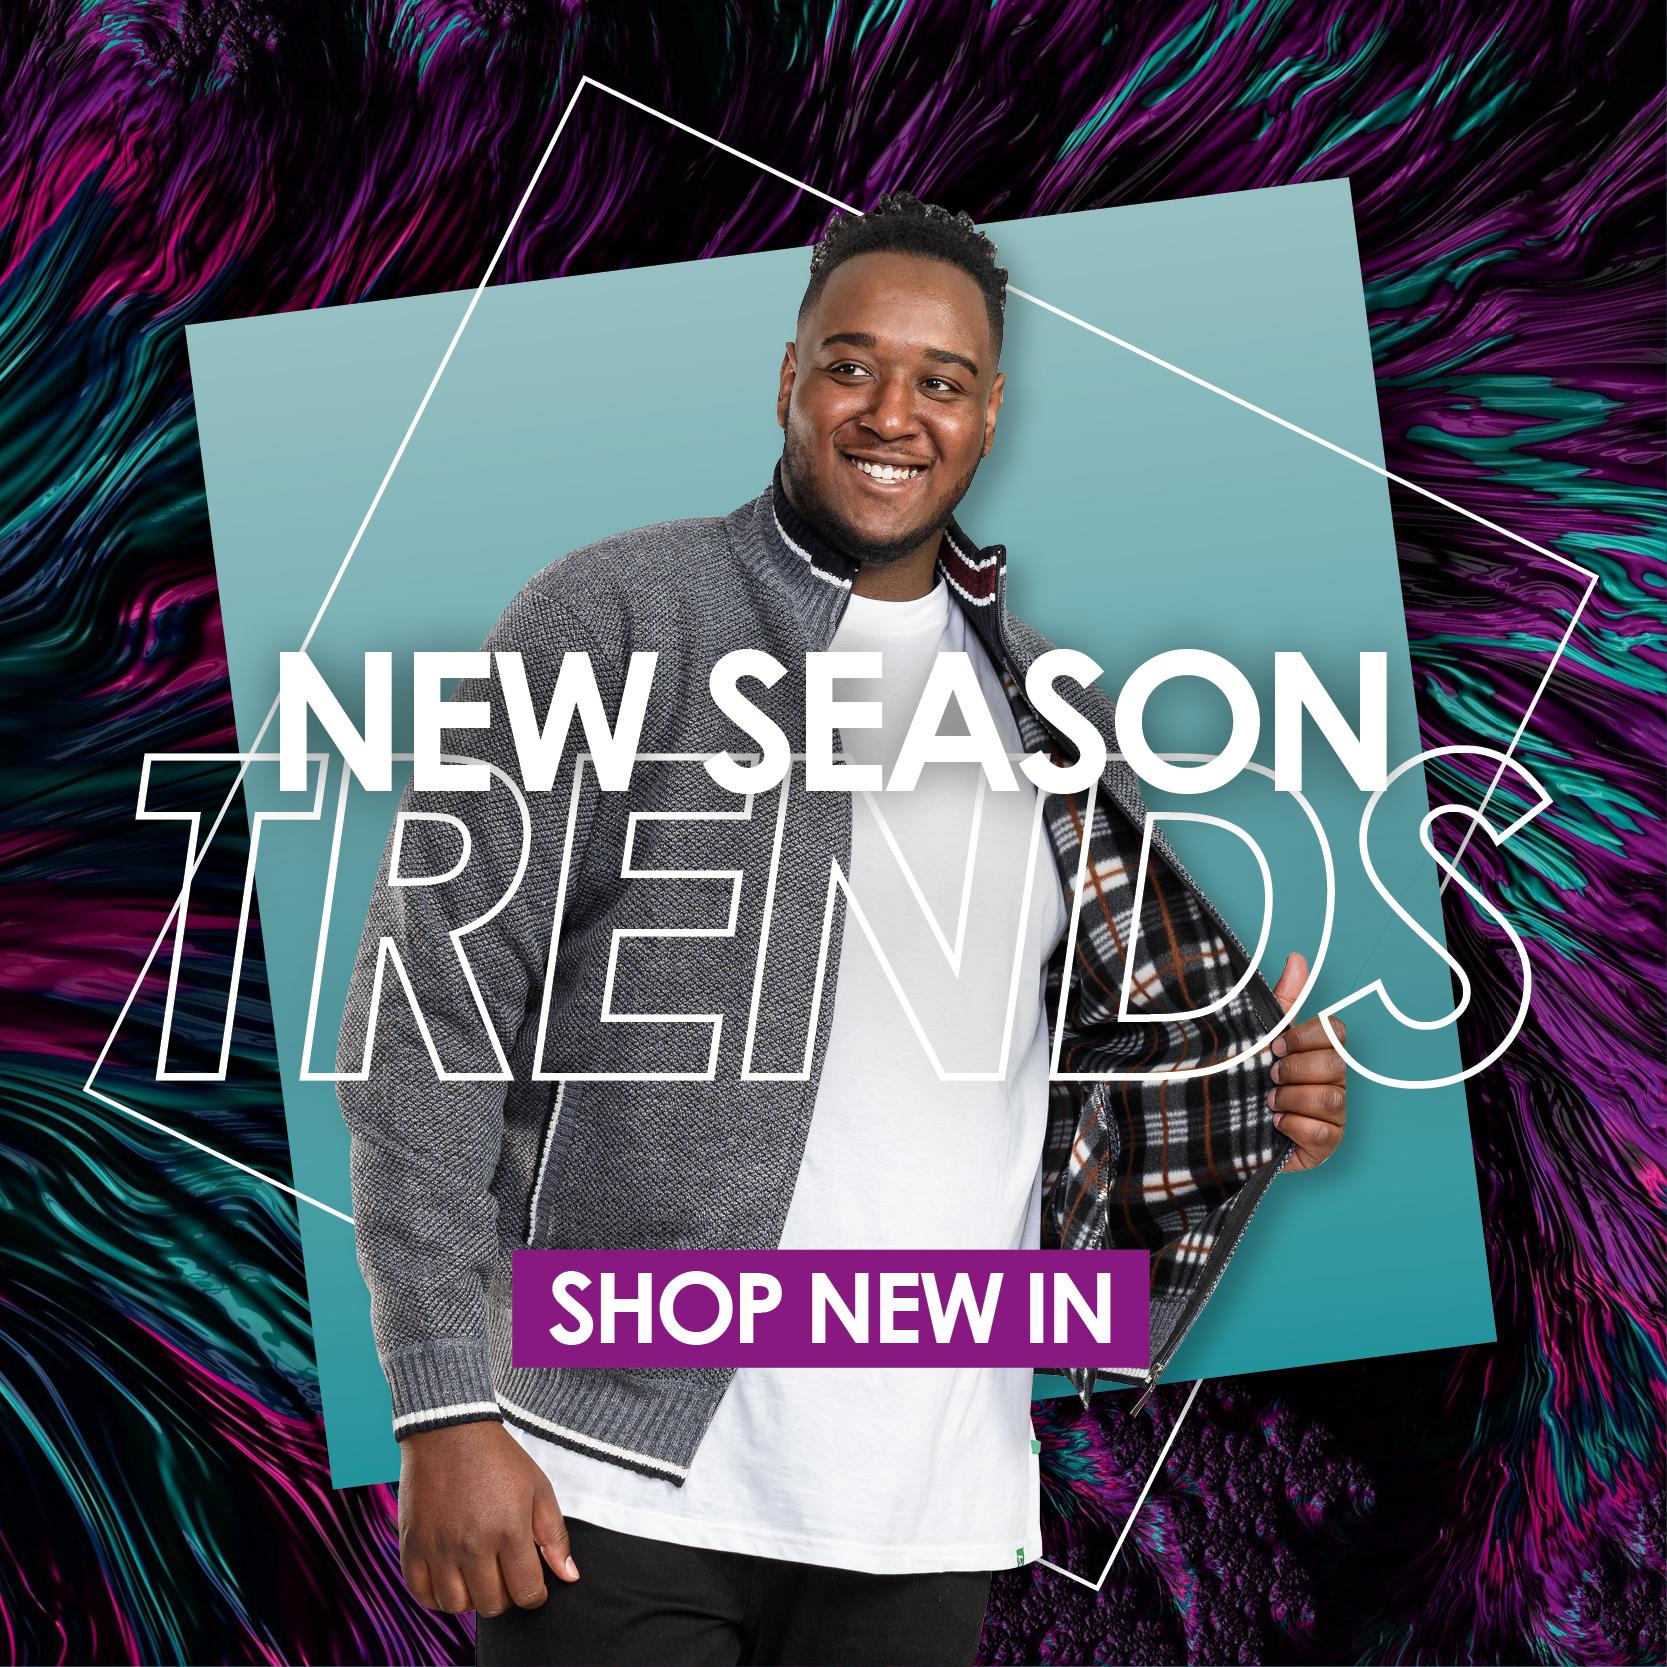 New Season Trends